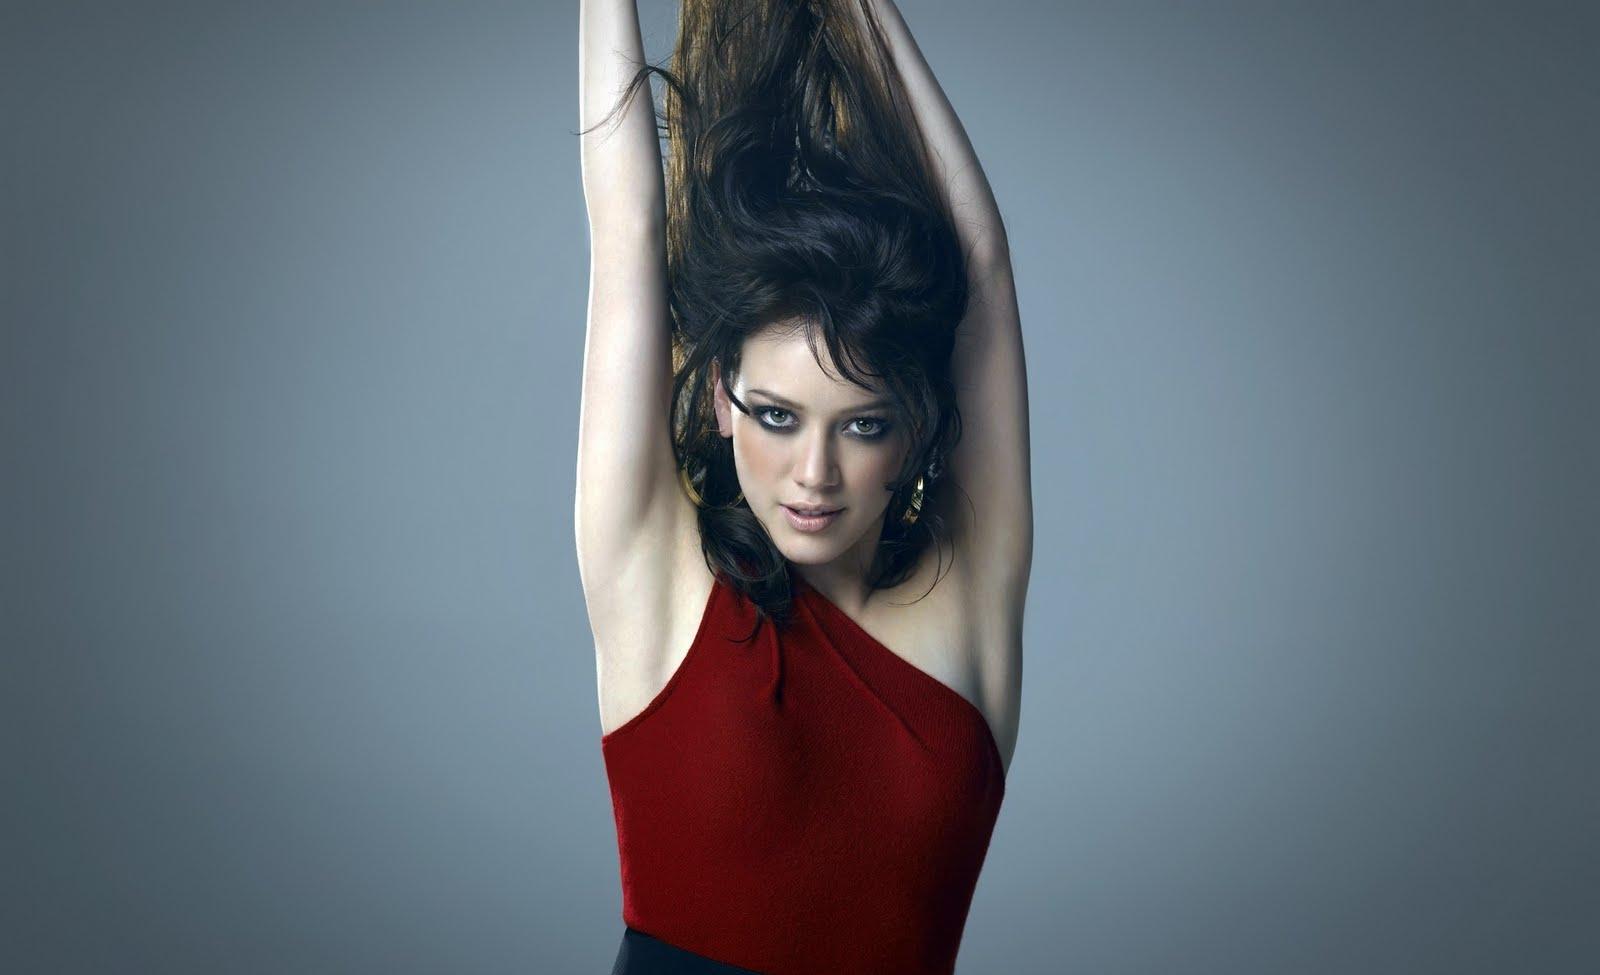 http://1.bp.blogspot.com/-9jmcnGRQr-g/TprF15rJkiI/AAAAAAAAGDk/SSJL_qnnysg/s1600/Hilary-Duff%2B%252810%2529.jpg